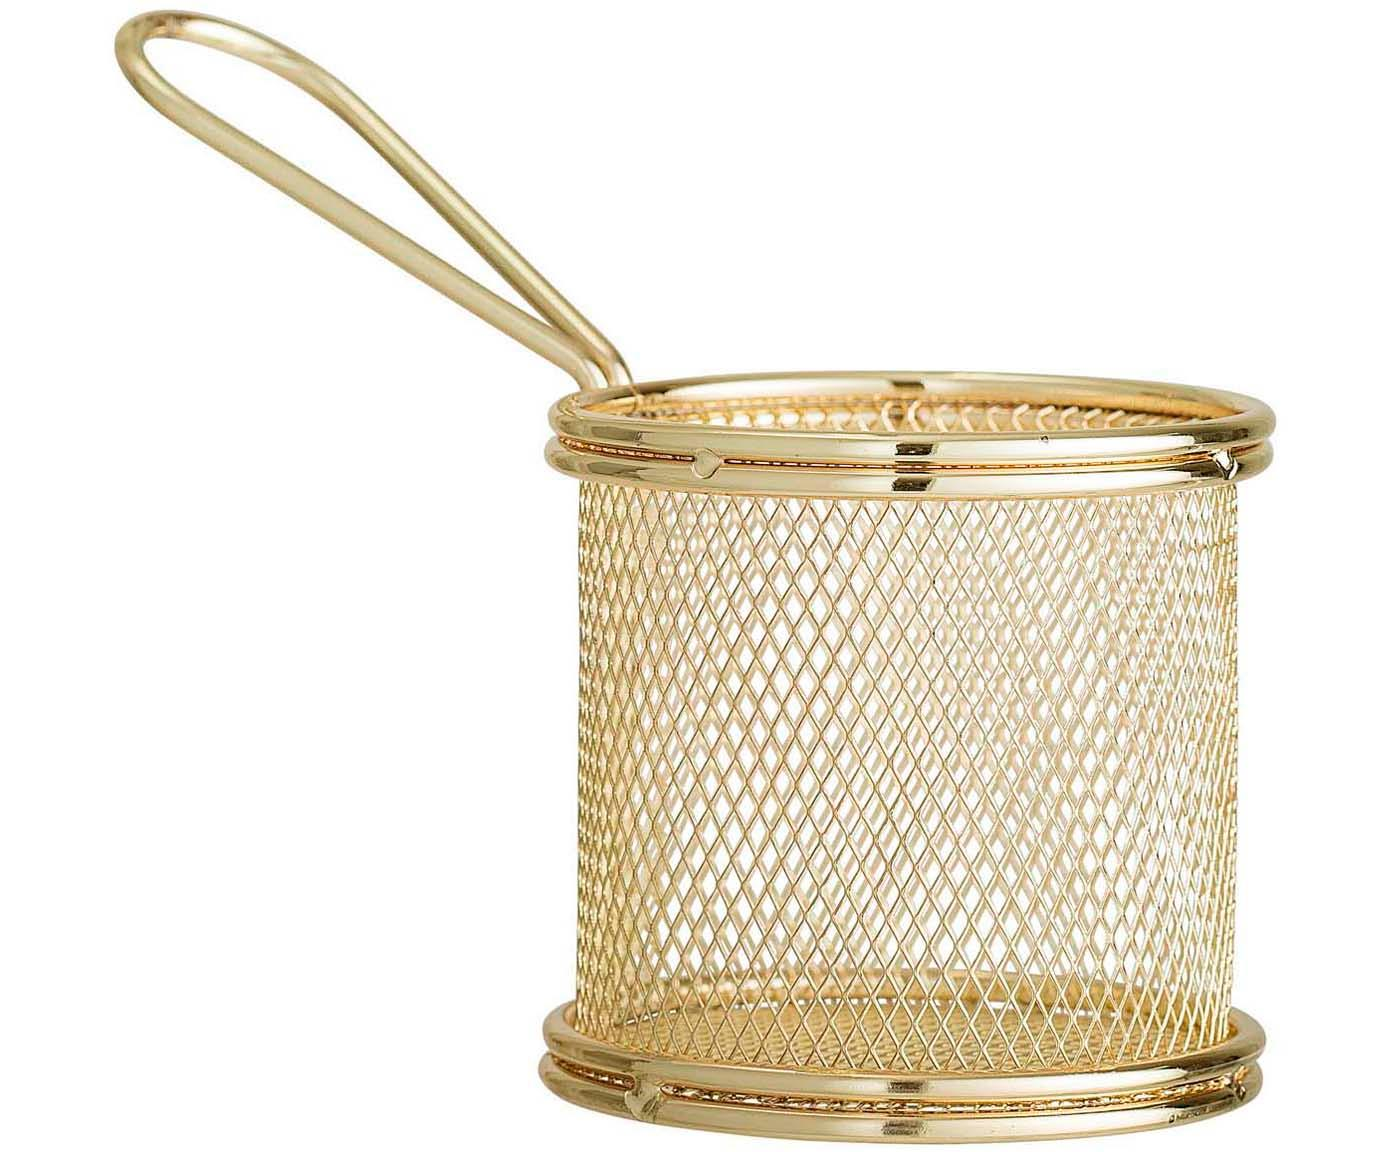 Serveermand Mingolet, Gecoat edelstaal, Messingkleurig, Ø 9 x H 9 cm